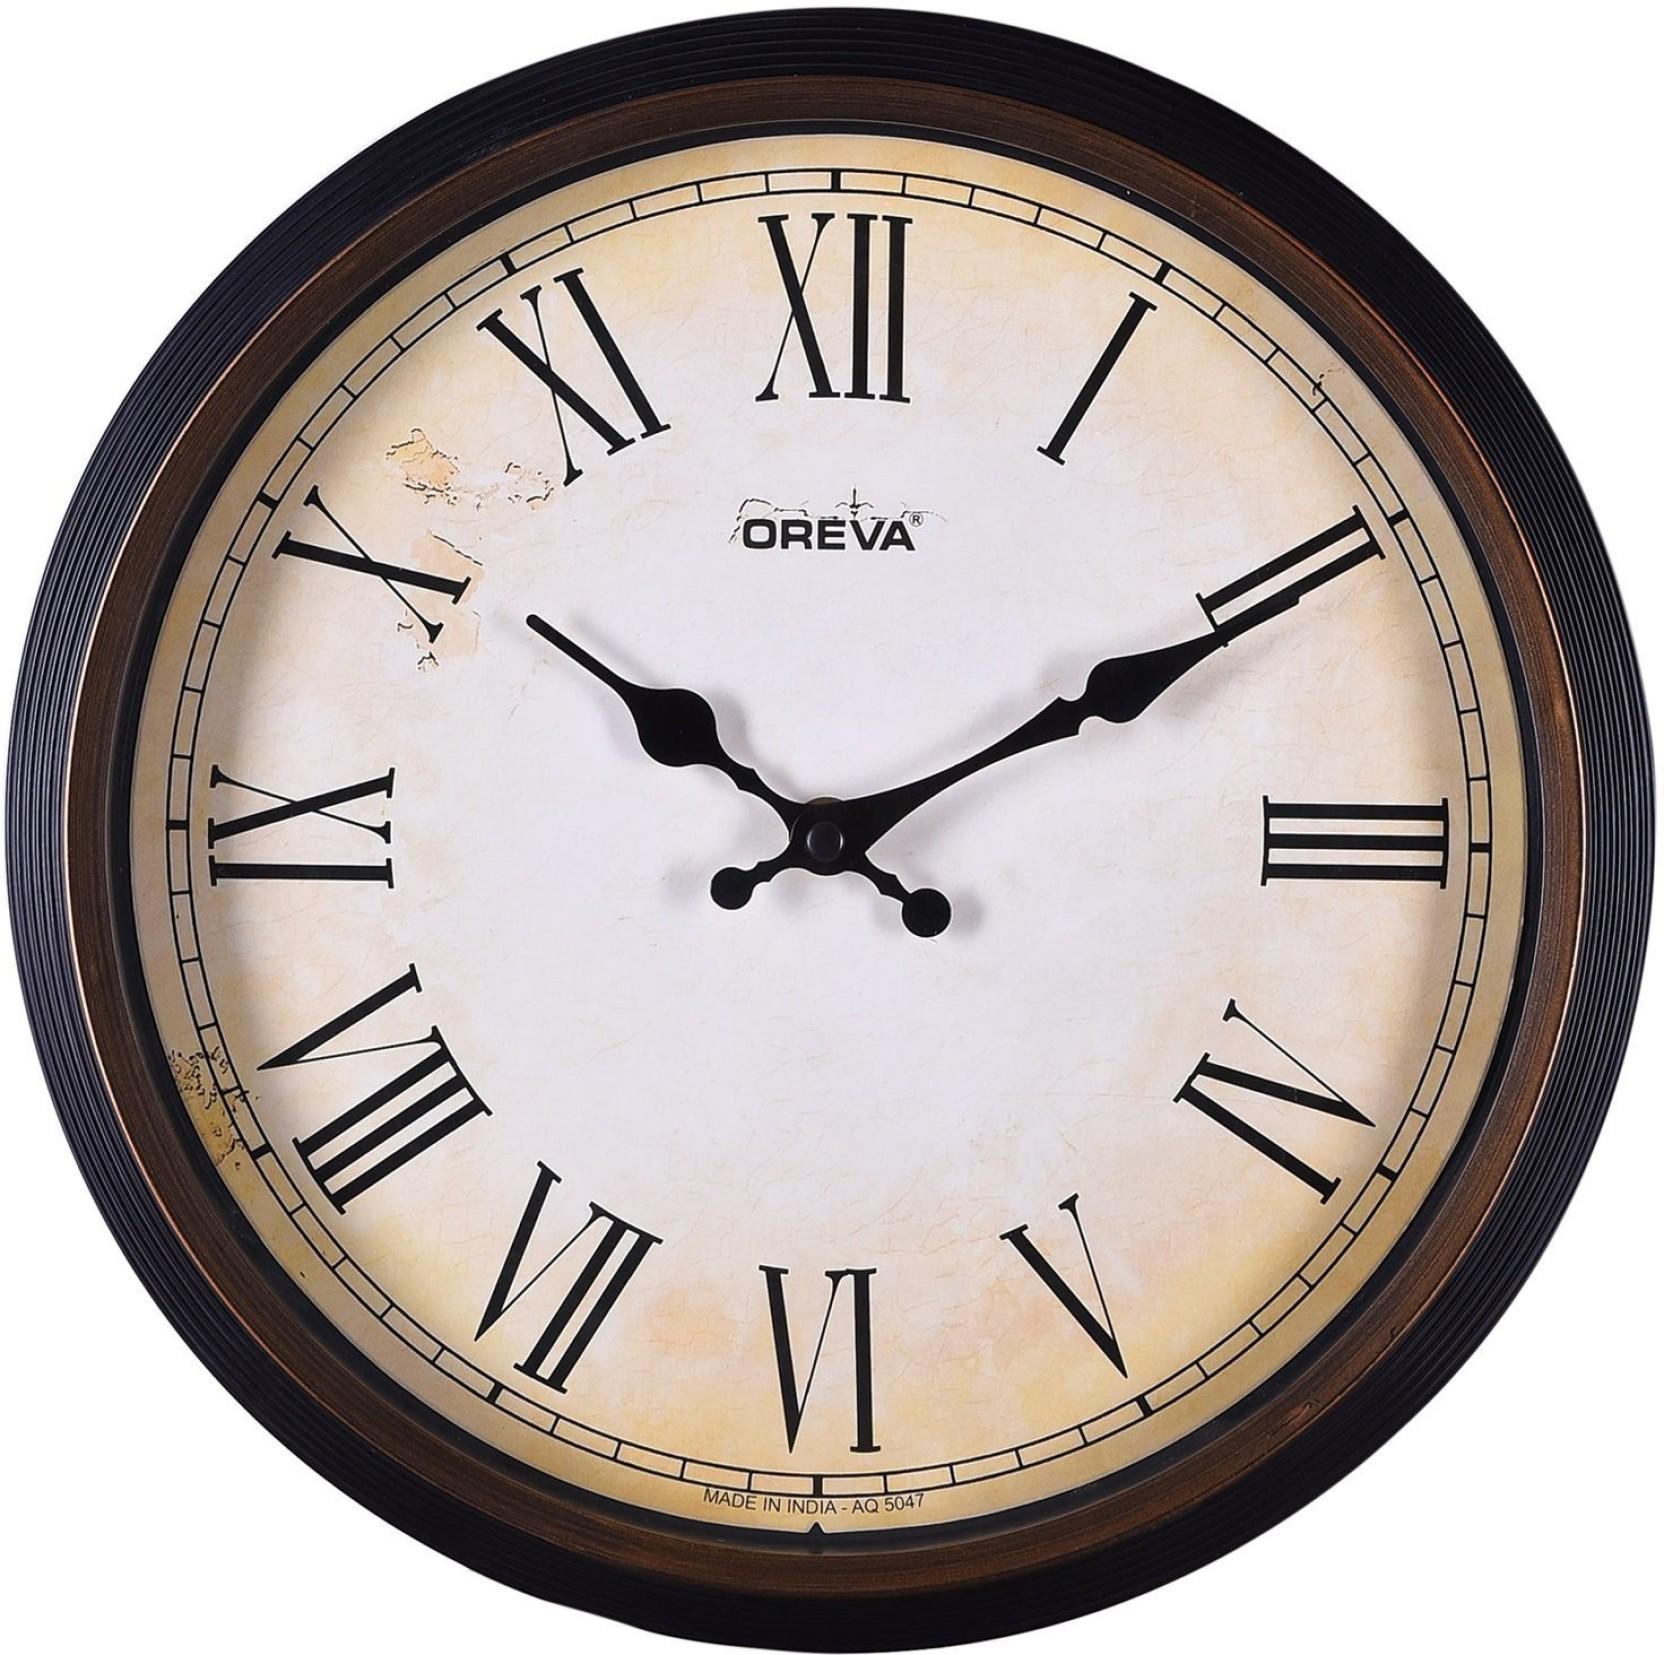 Oreva ajanta analog wall clock price in india buy oreva ajanta oreva ajanta analog wall clock add to cart amipublicfo Images